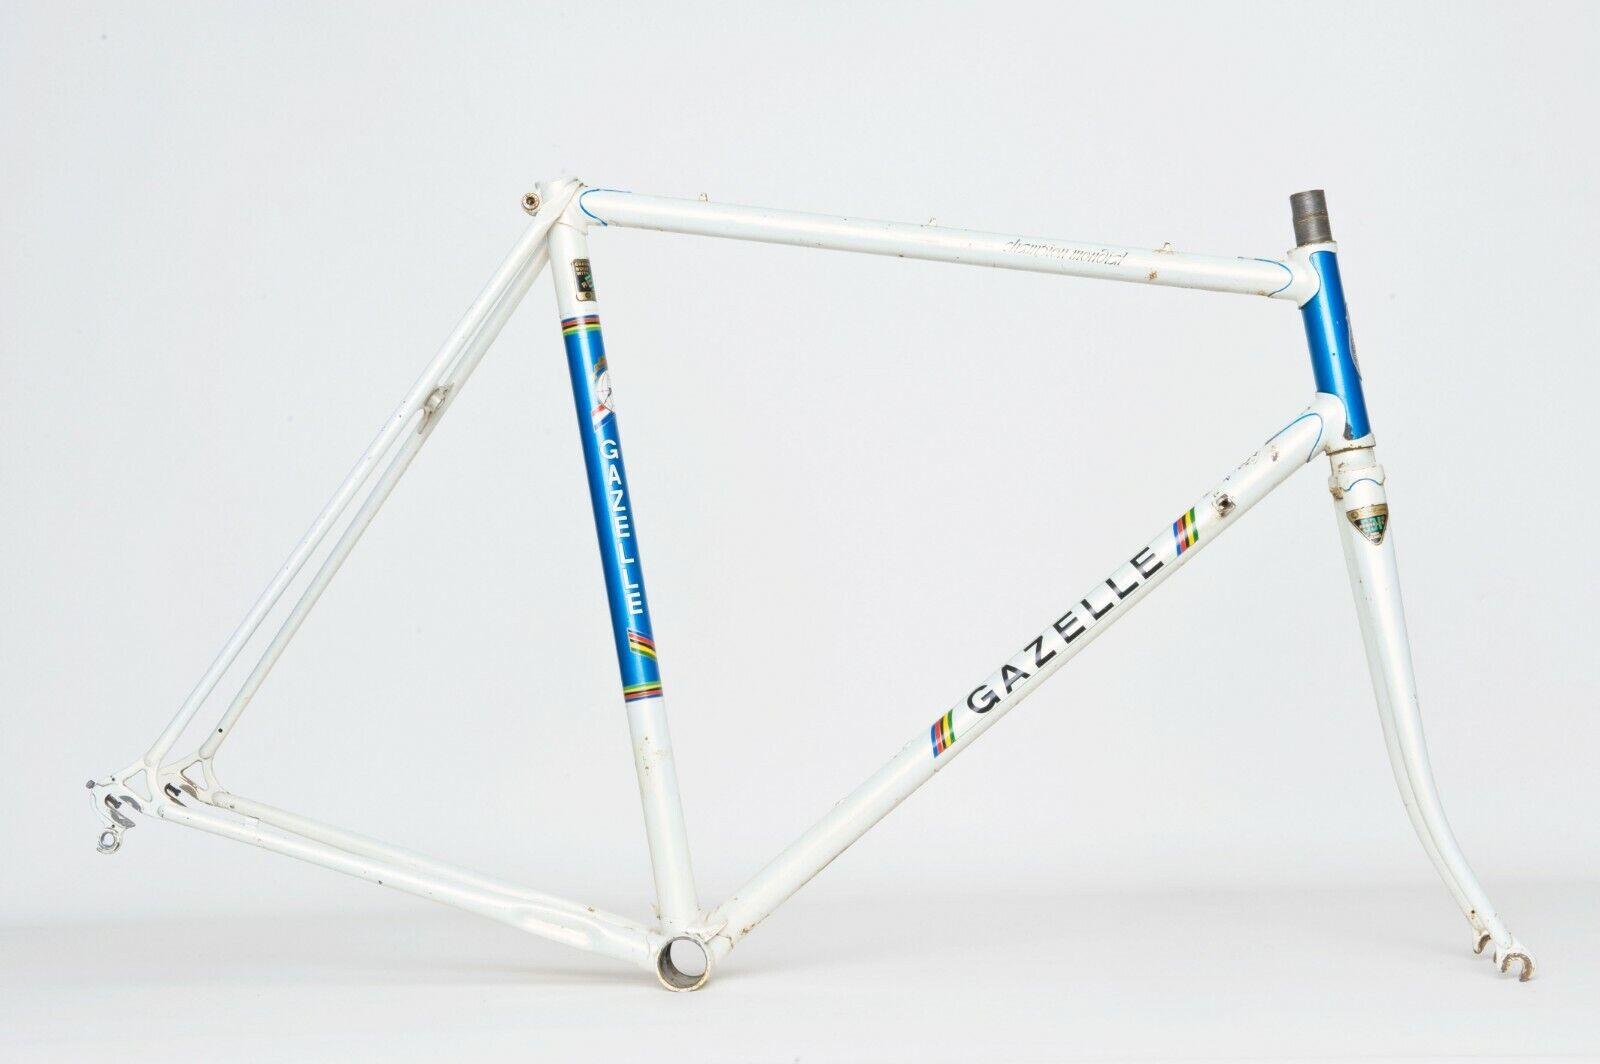 Vintage Gazelle Champion Mondial a-frame rahmenset 57,5cm.